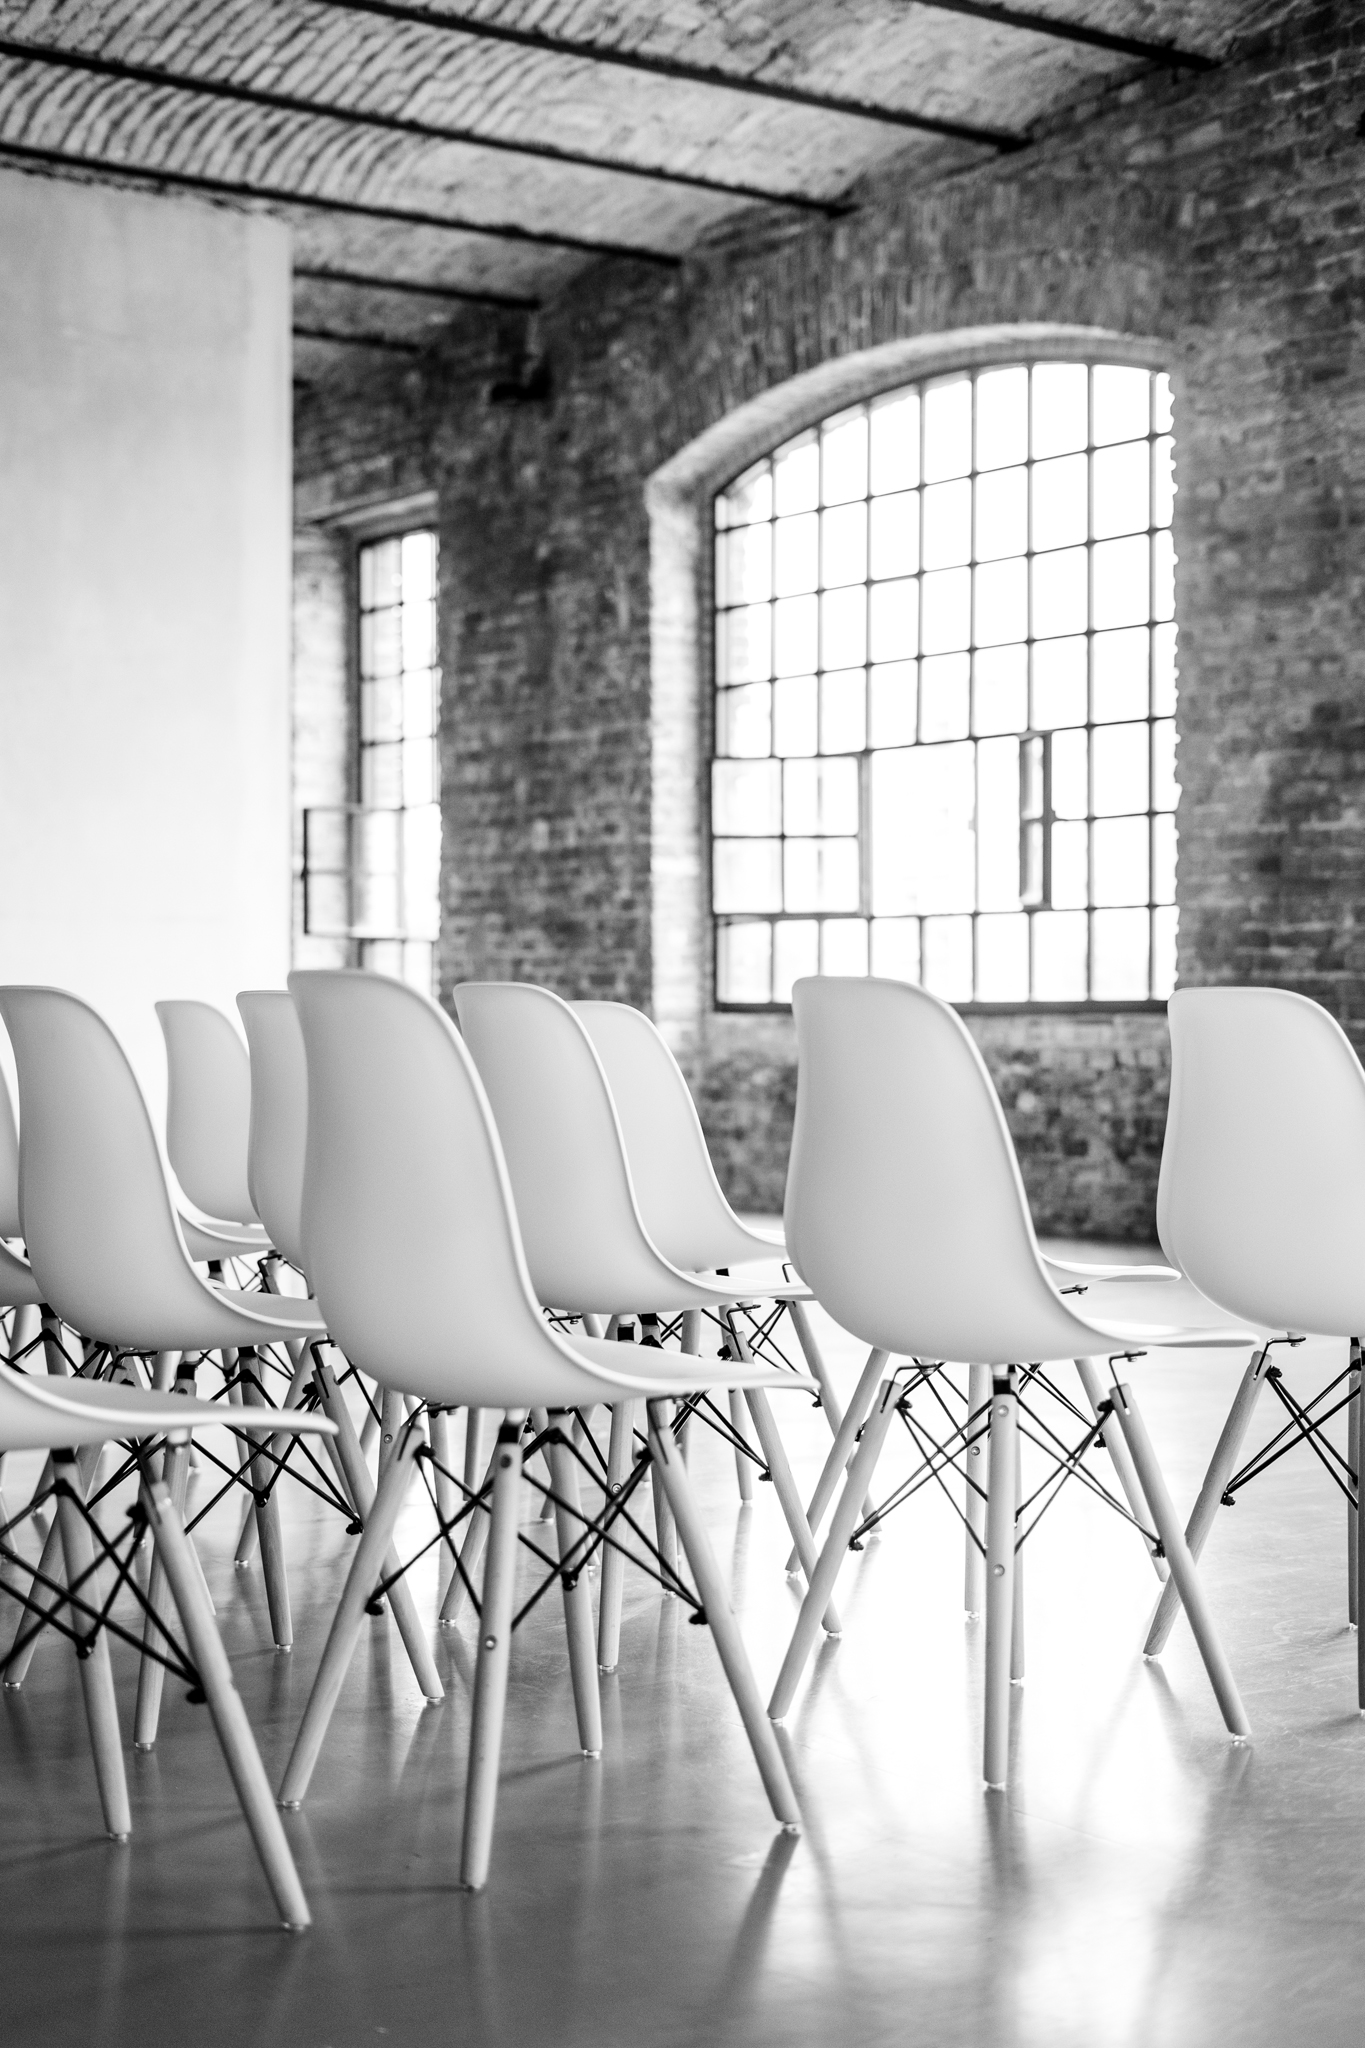 YESS event hire - arculattervezés